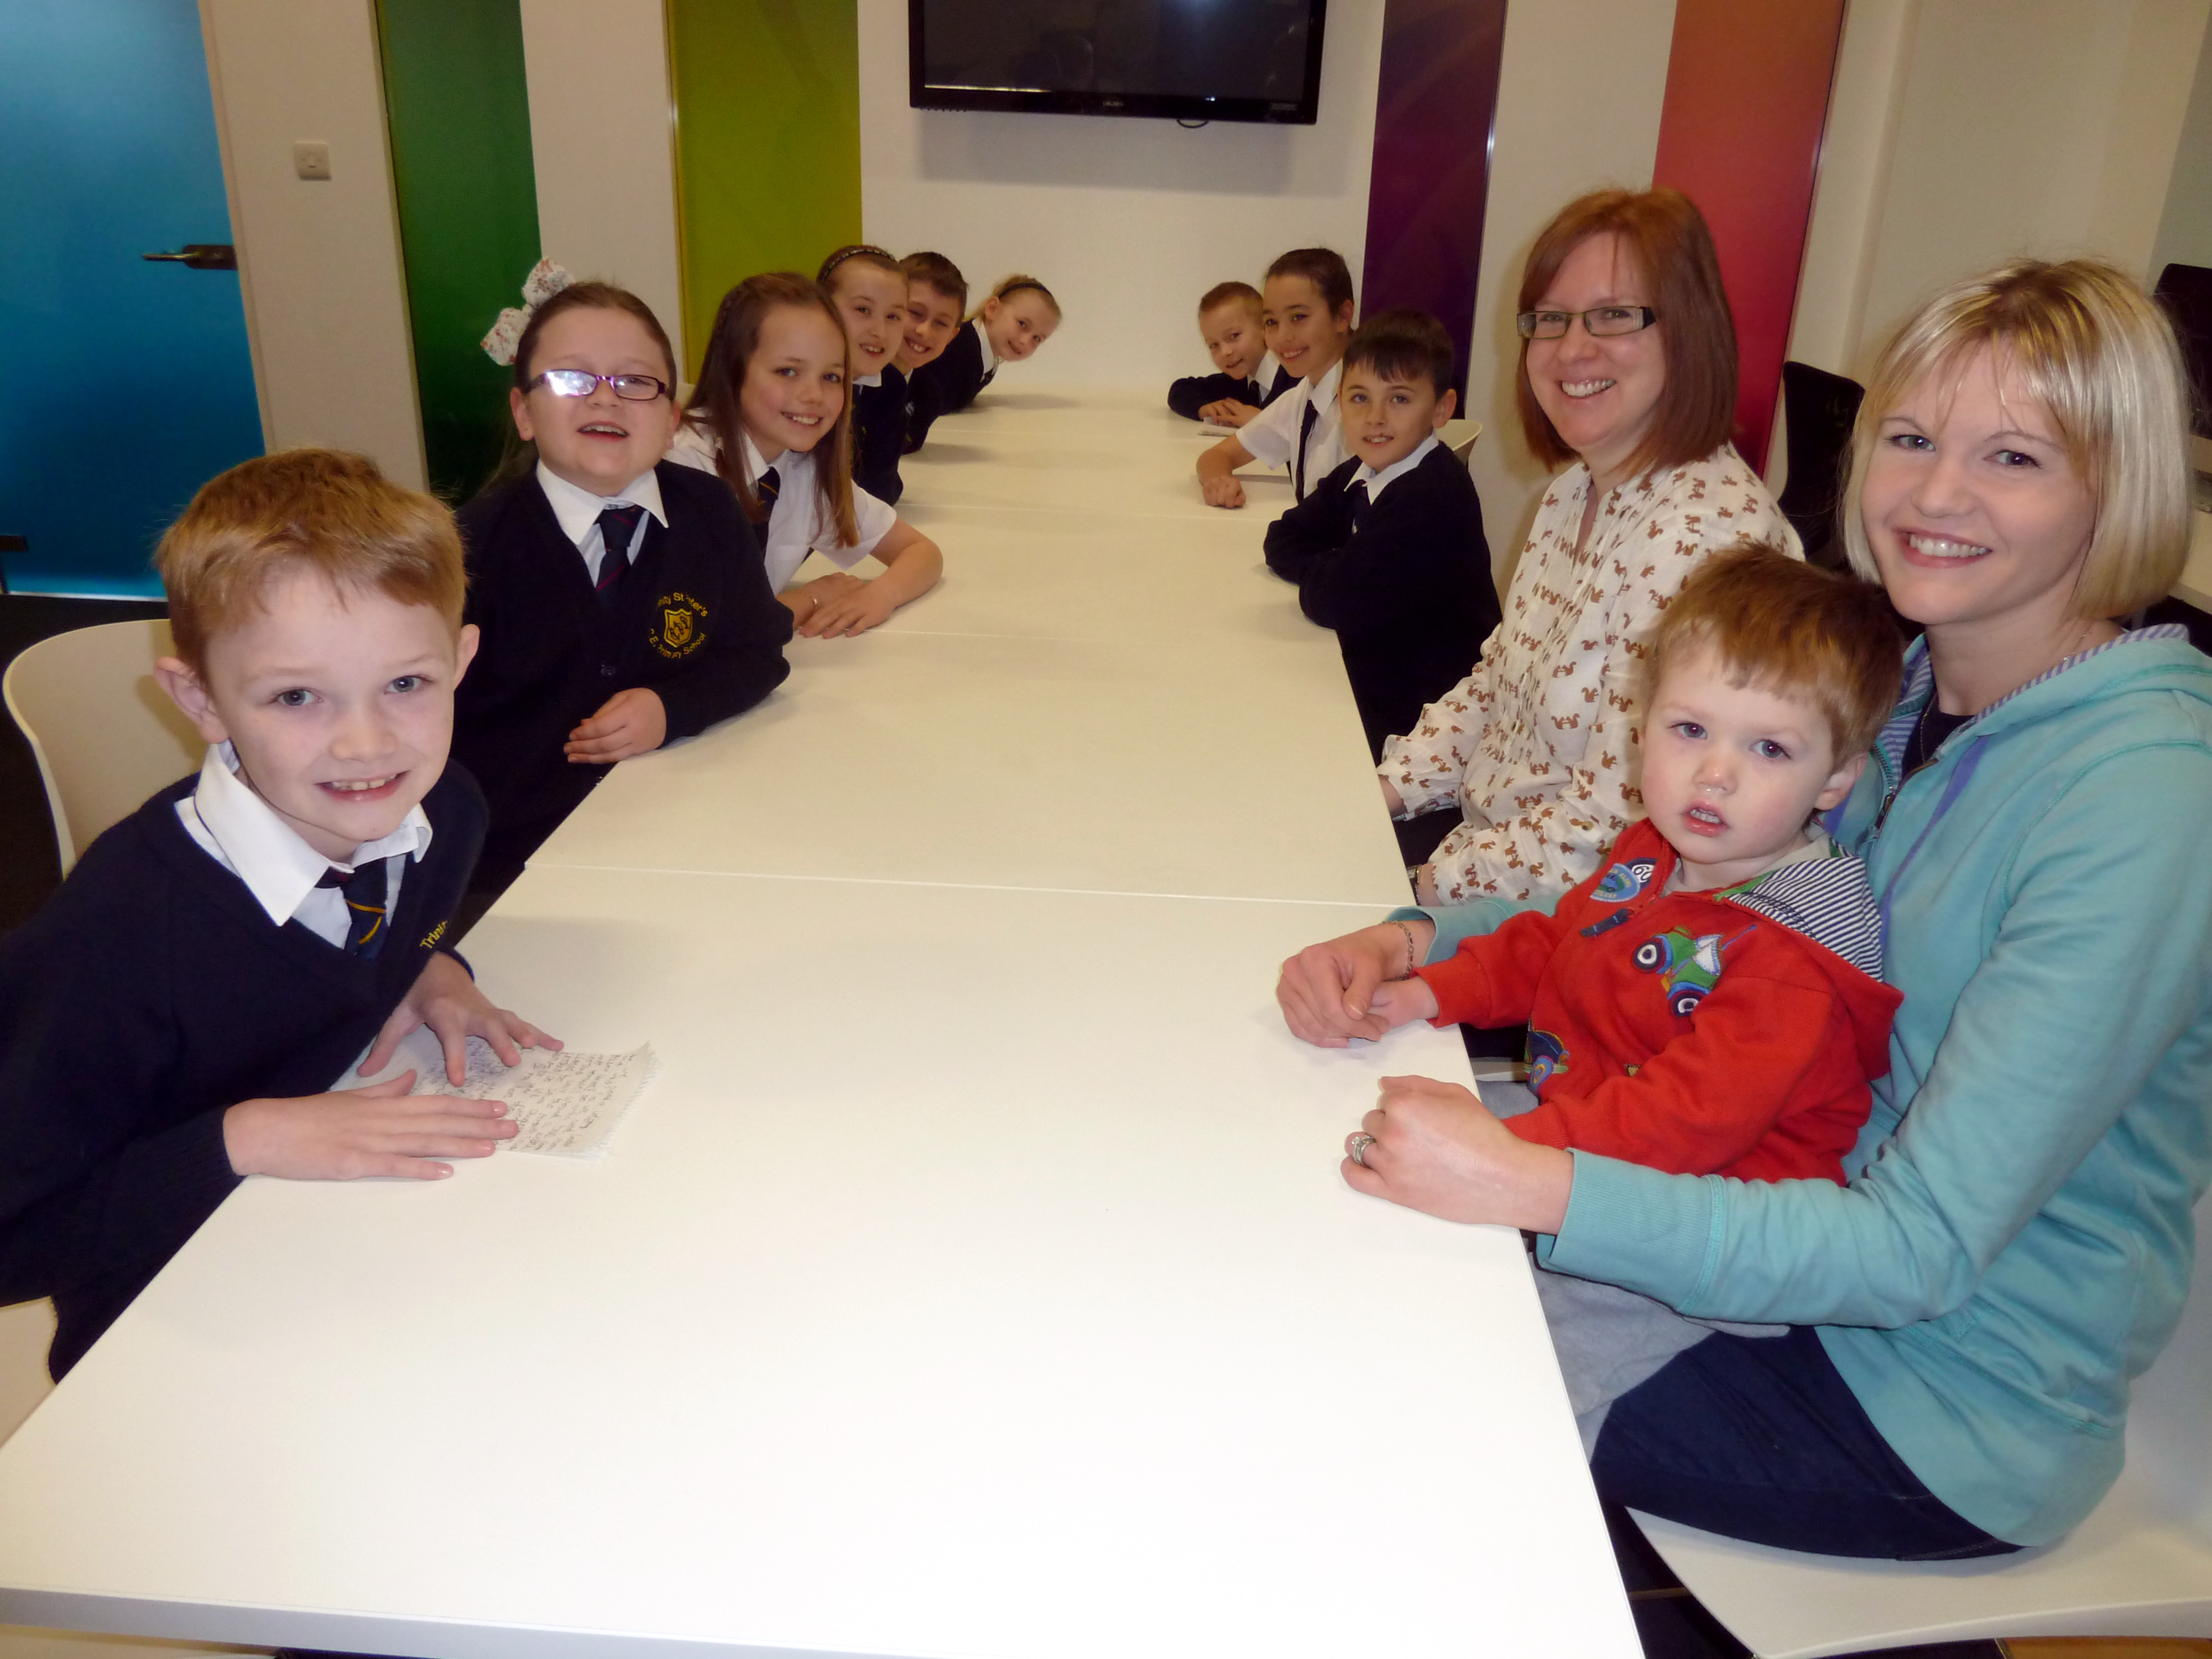 Cllr Nina Killen attends Trinity St Peter's School Council